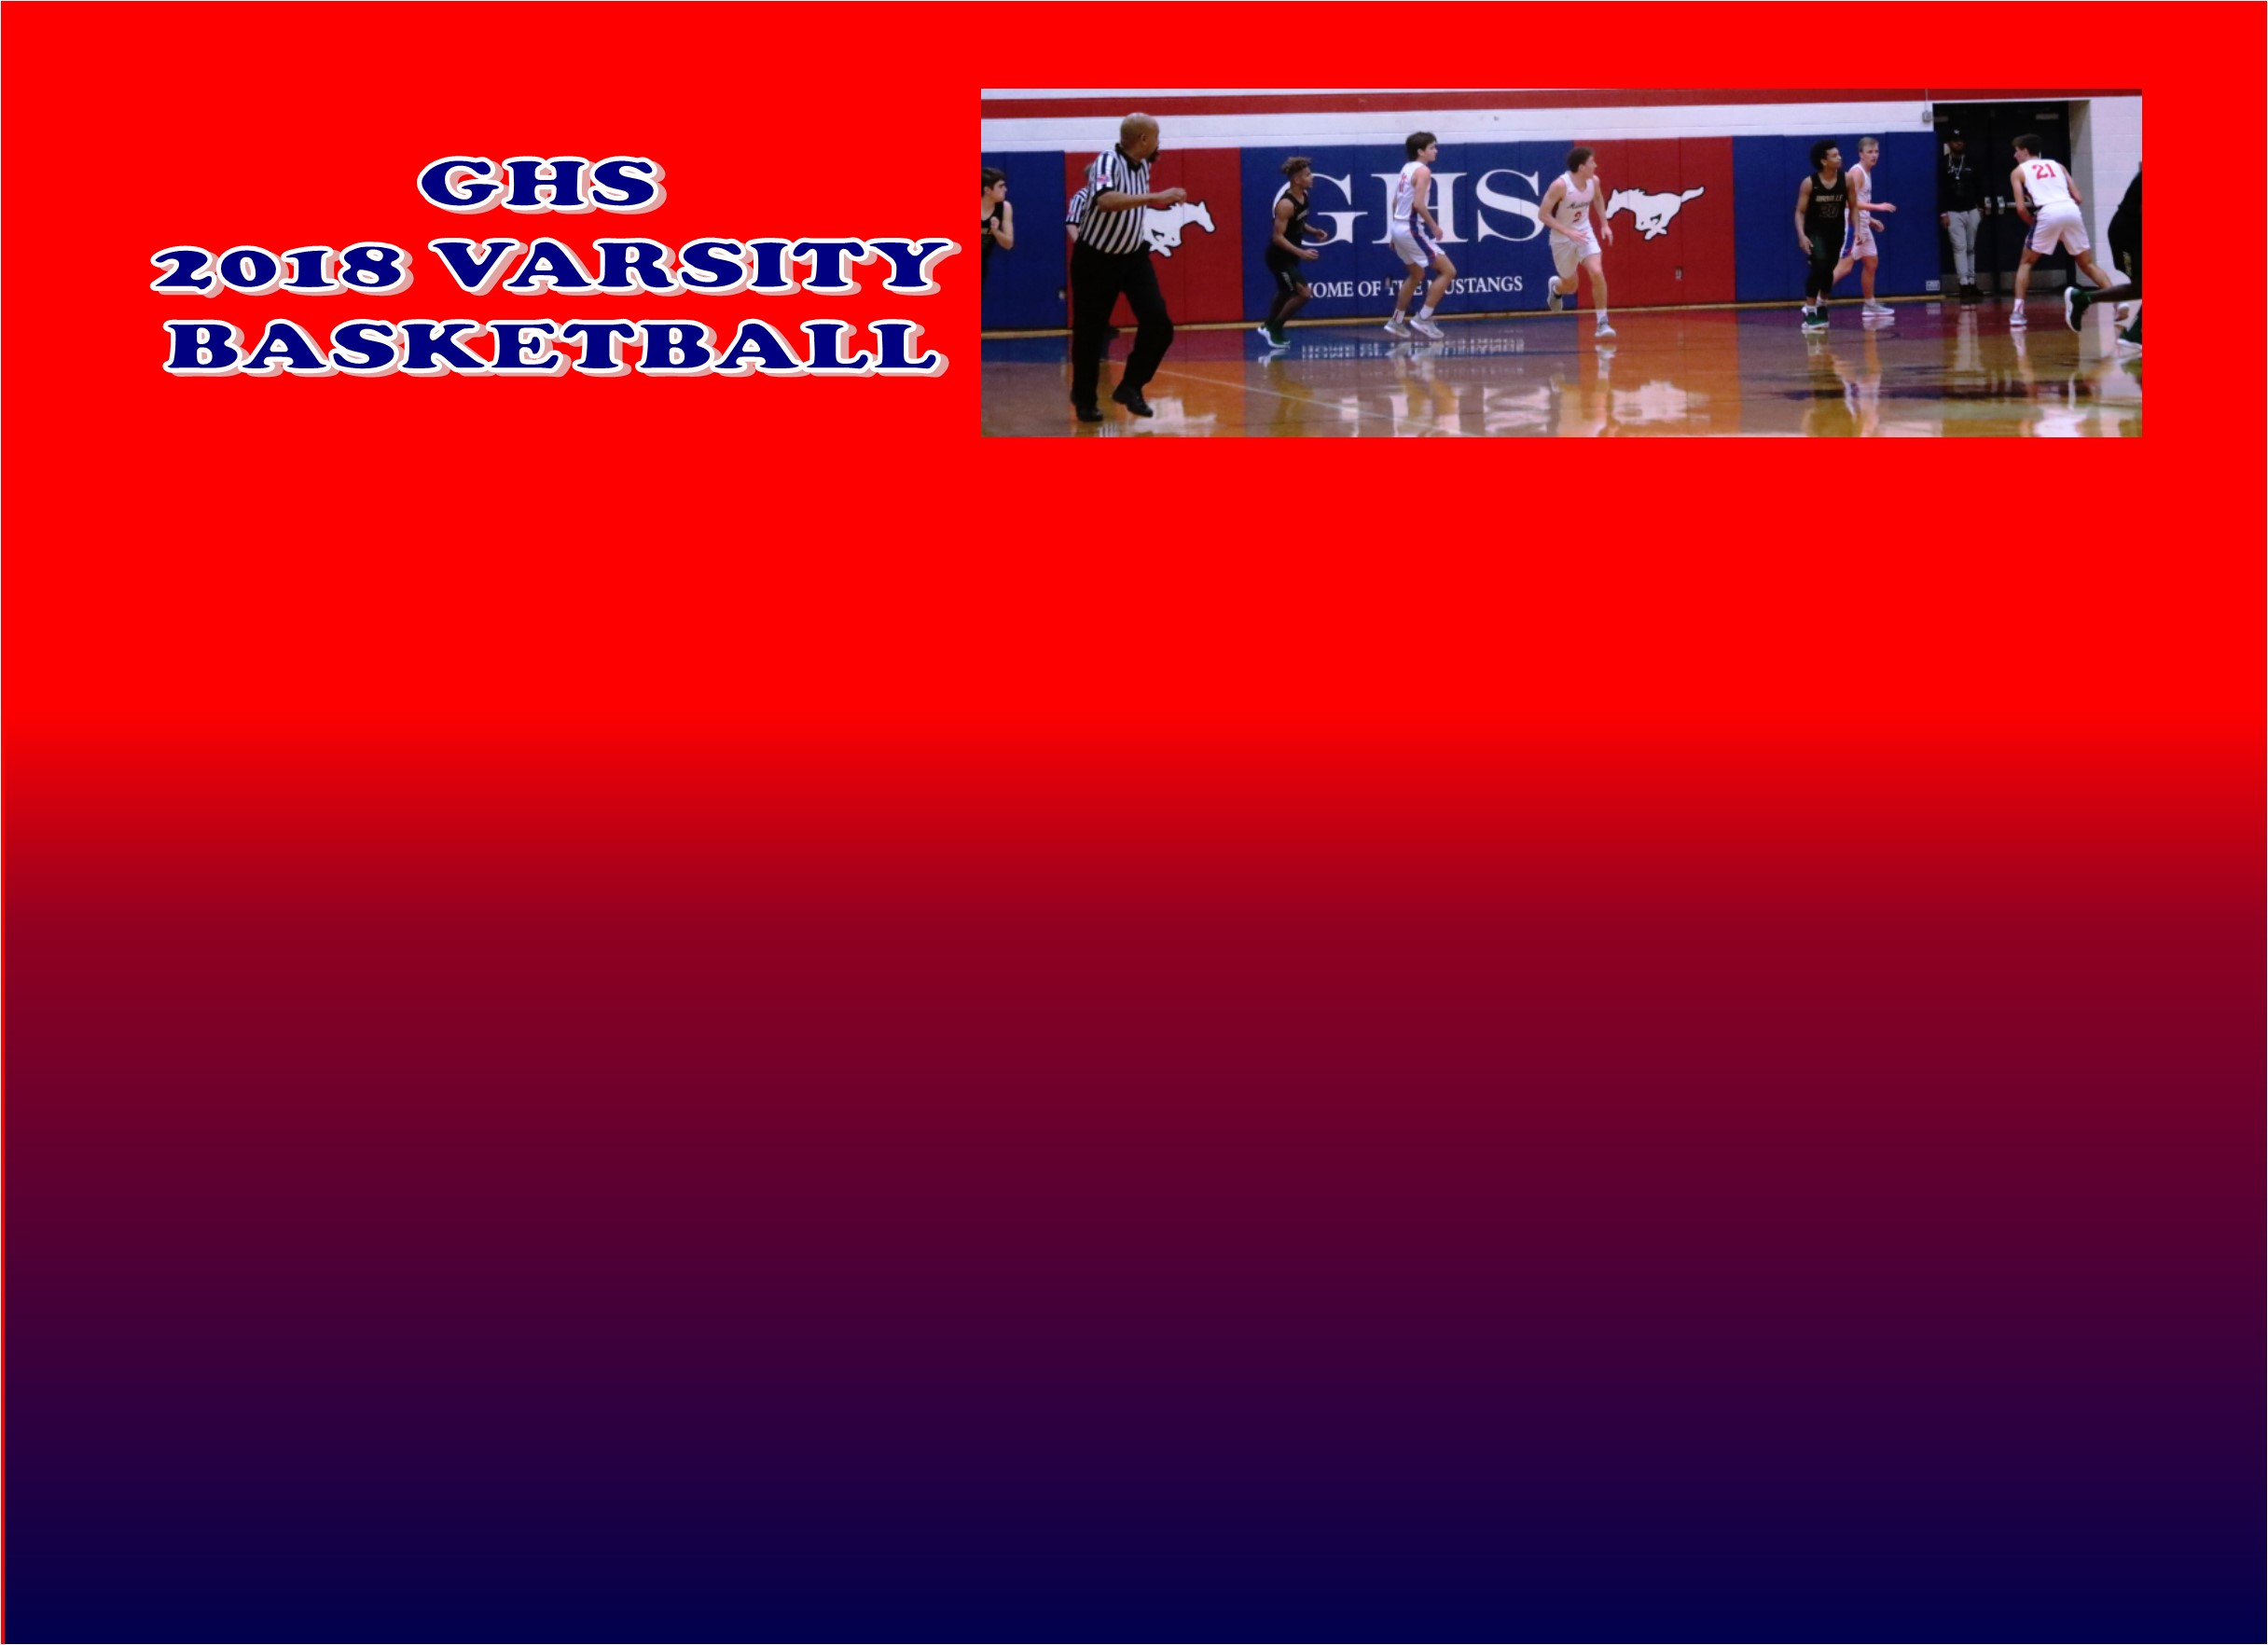 GHS Basketball: Grapevine Mustangs Triumph Over Birdville Hawks 77-60